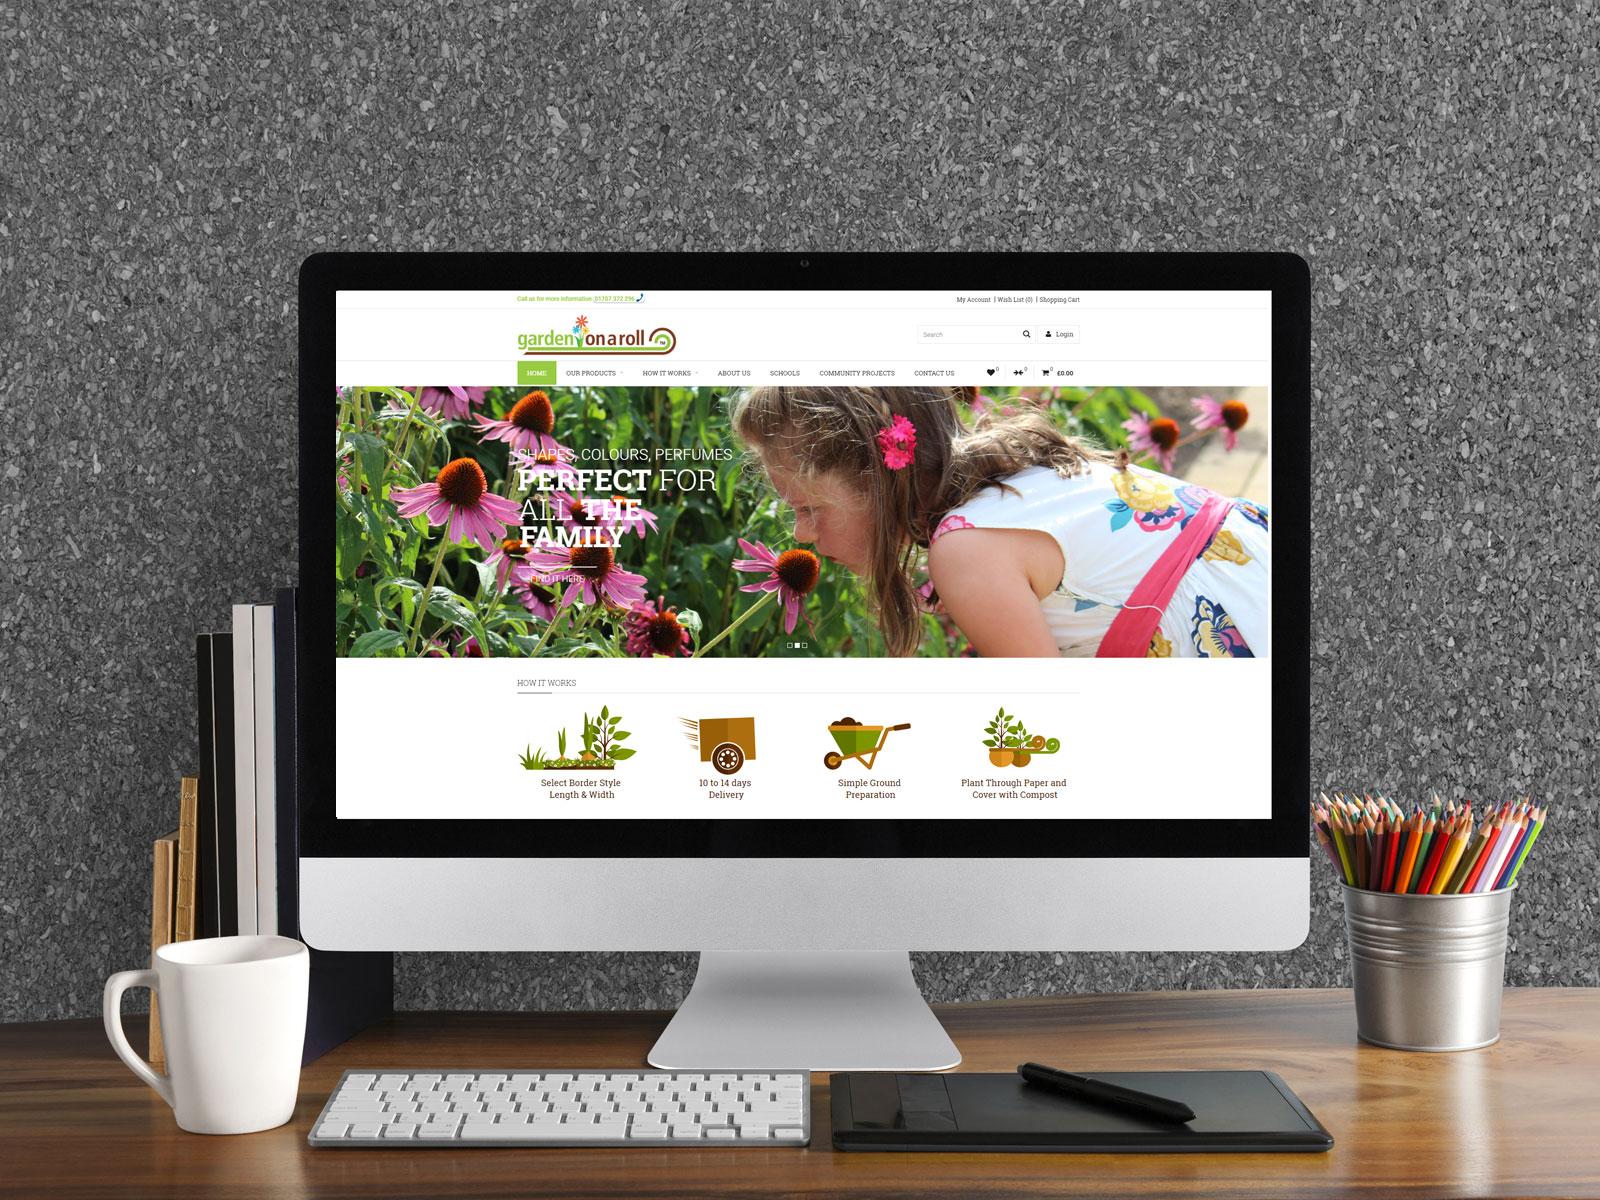 Gardenonaroll Responsive Design